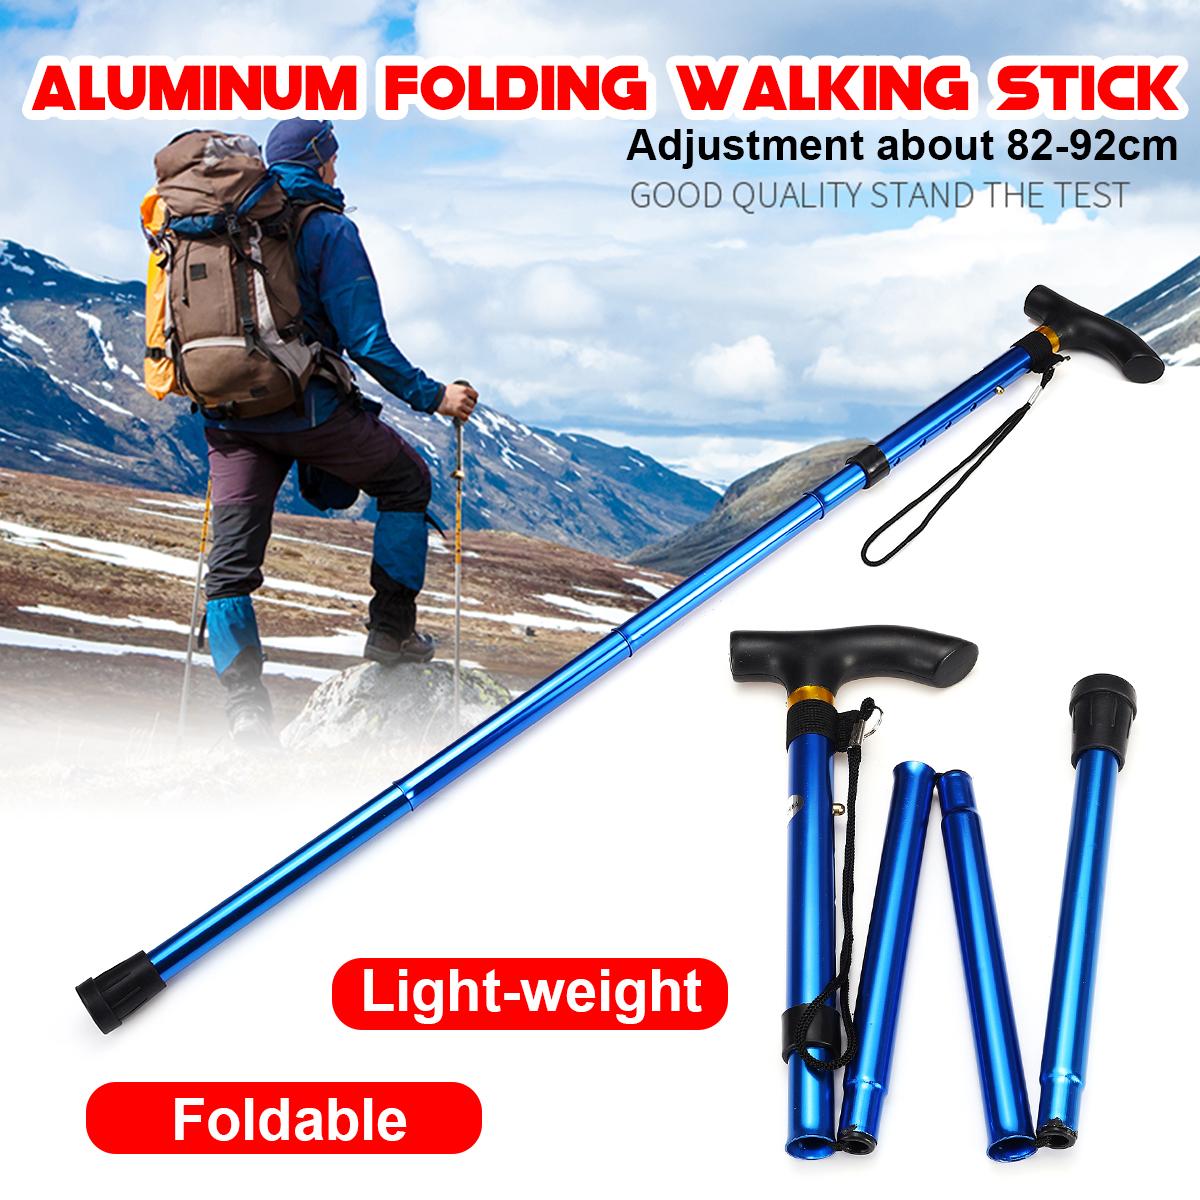 5-Section Adjustable Aluminum Walking Stick